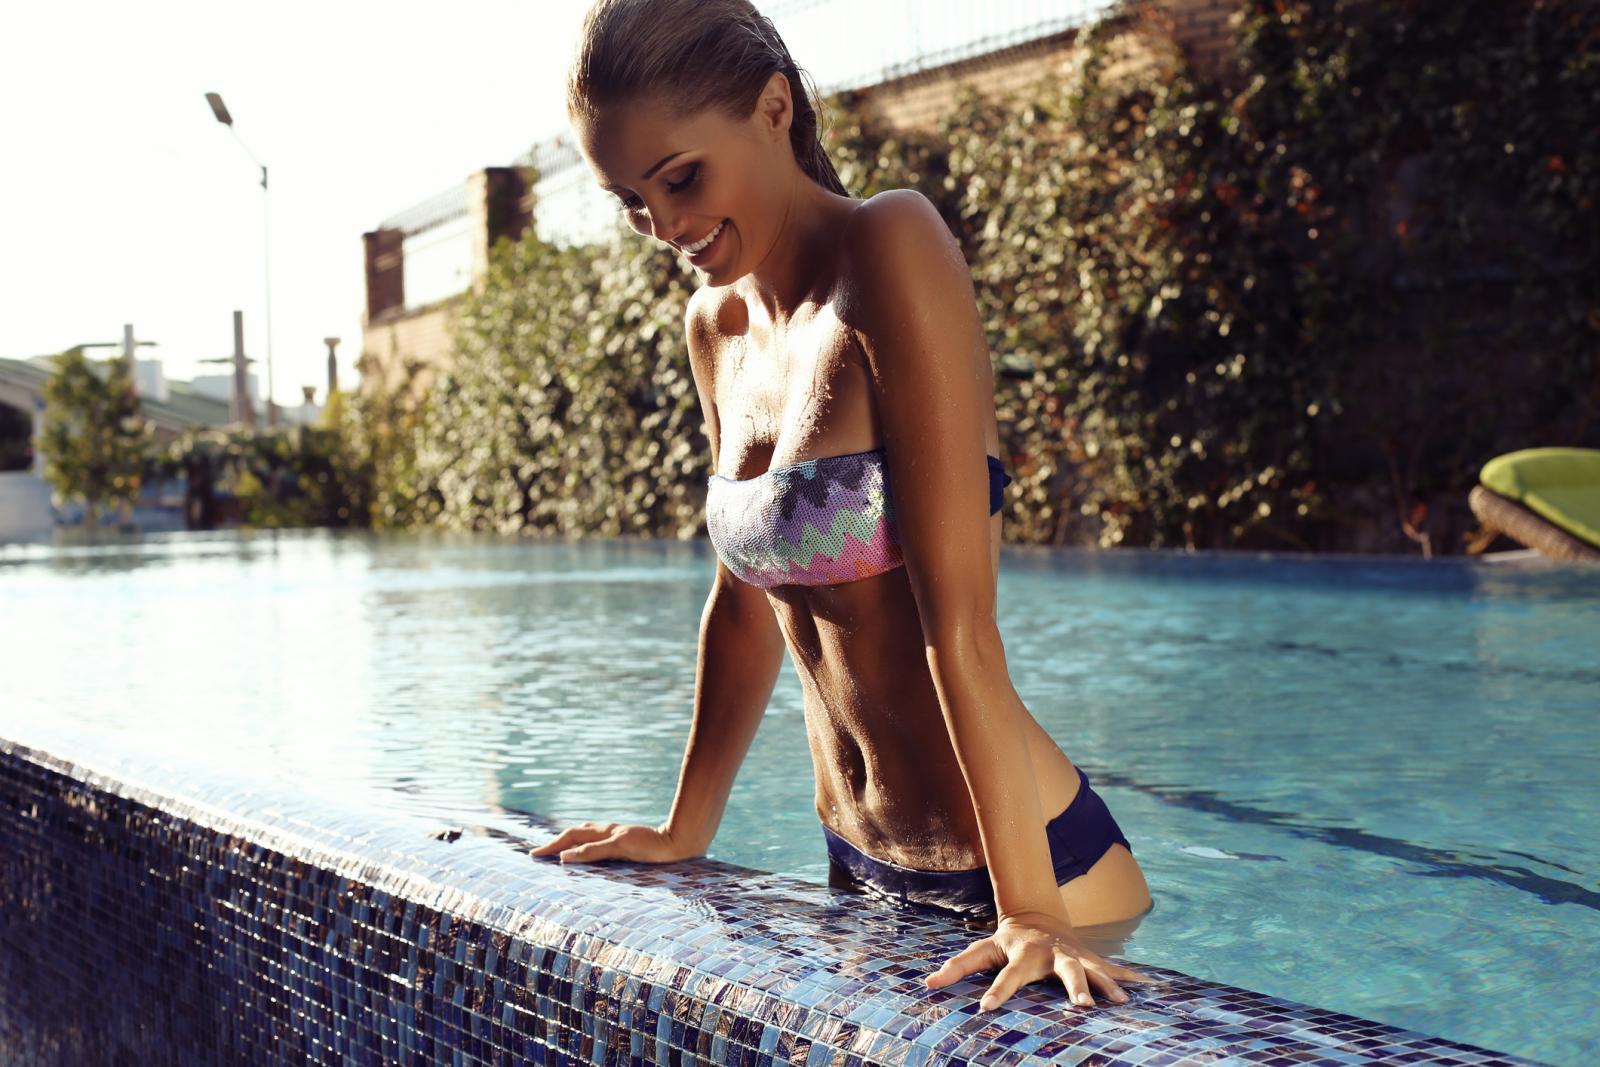 Lagano plivajući troši se oko 200 kalorija na sat, no uz malo jači intenzitet u četrdesetak minuta može se potrošiti 600 kalorija, čak i više.